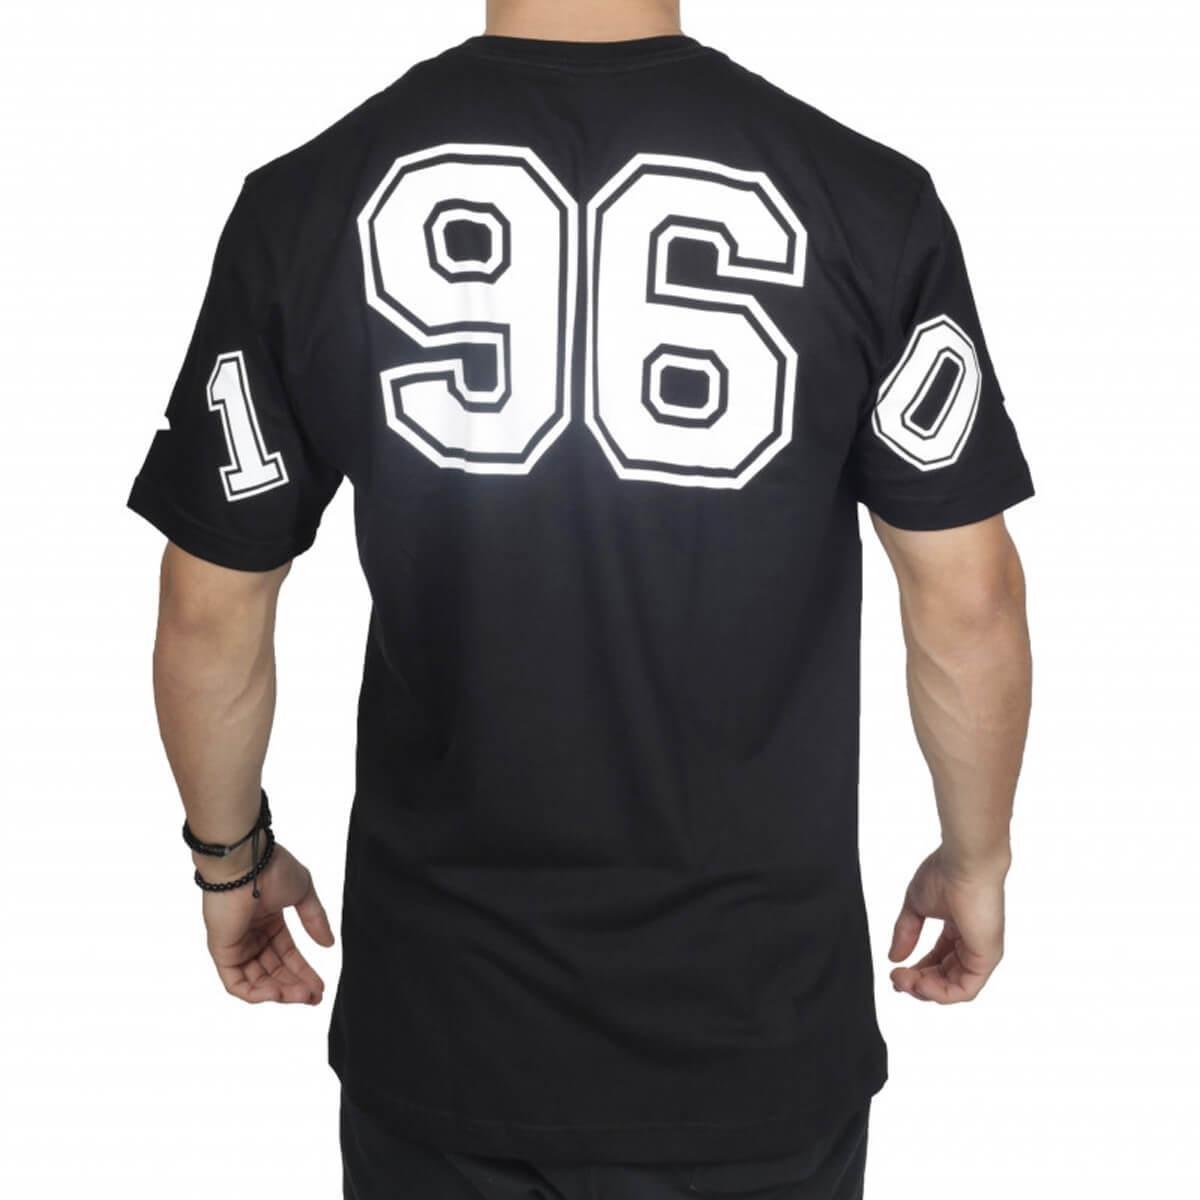 Preto Era Camiseta star Raiders NFL Raiders Camiseta Number New Oakland Oakland xSvURqwZ